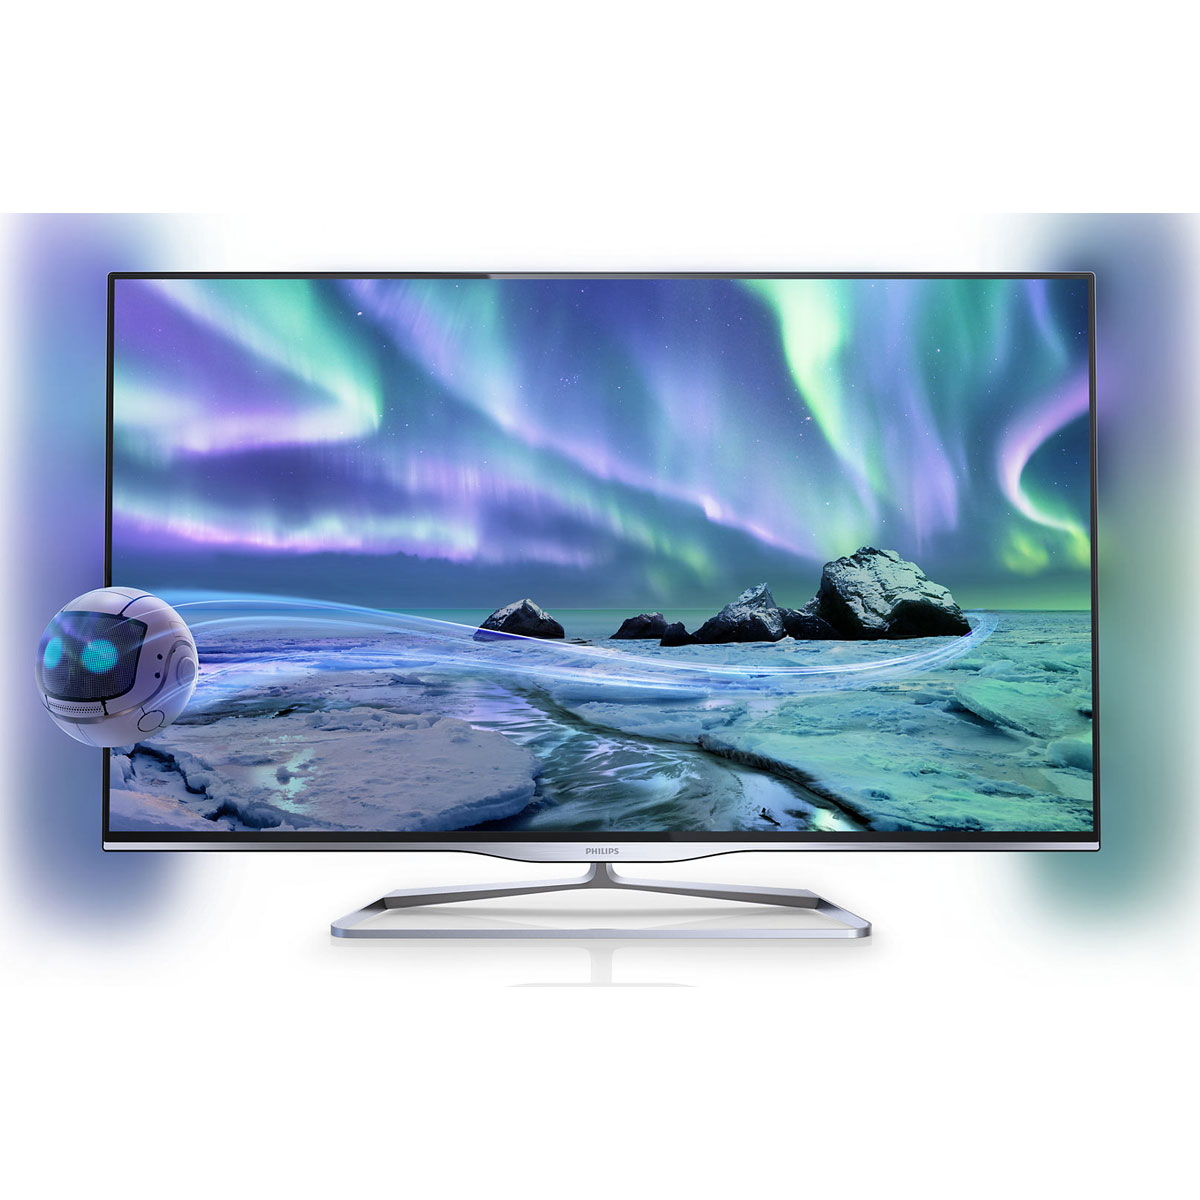 philips 32pfl5008h 32pfl5008h achat vente tv sur. Black Bedroom Furniture Sets. Home Design Ideas